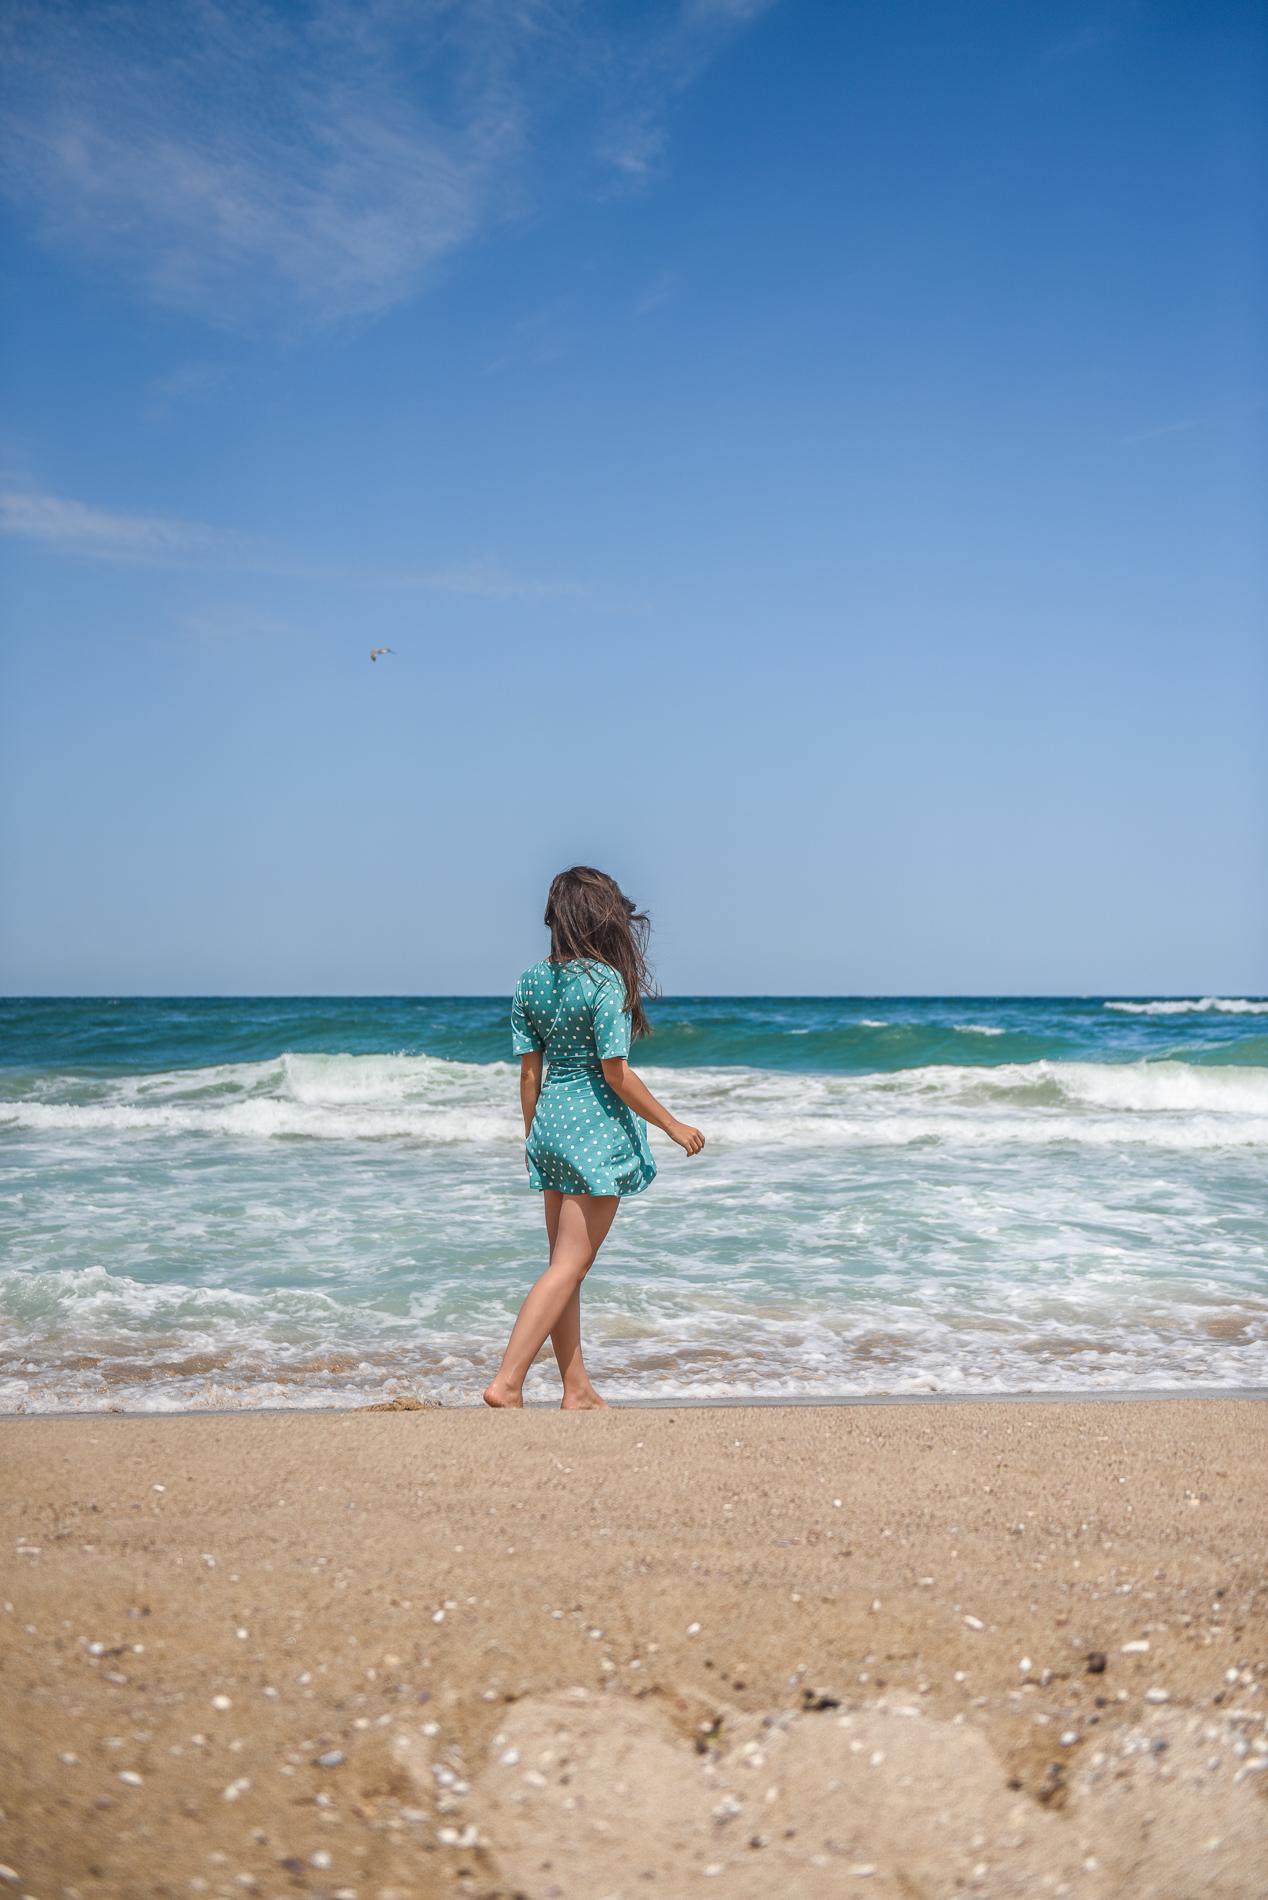 plaże bułgaria zdjęcia